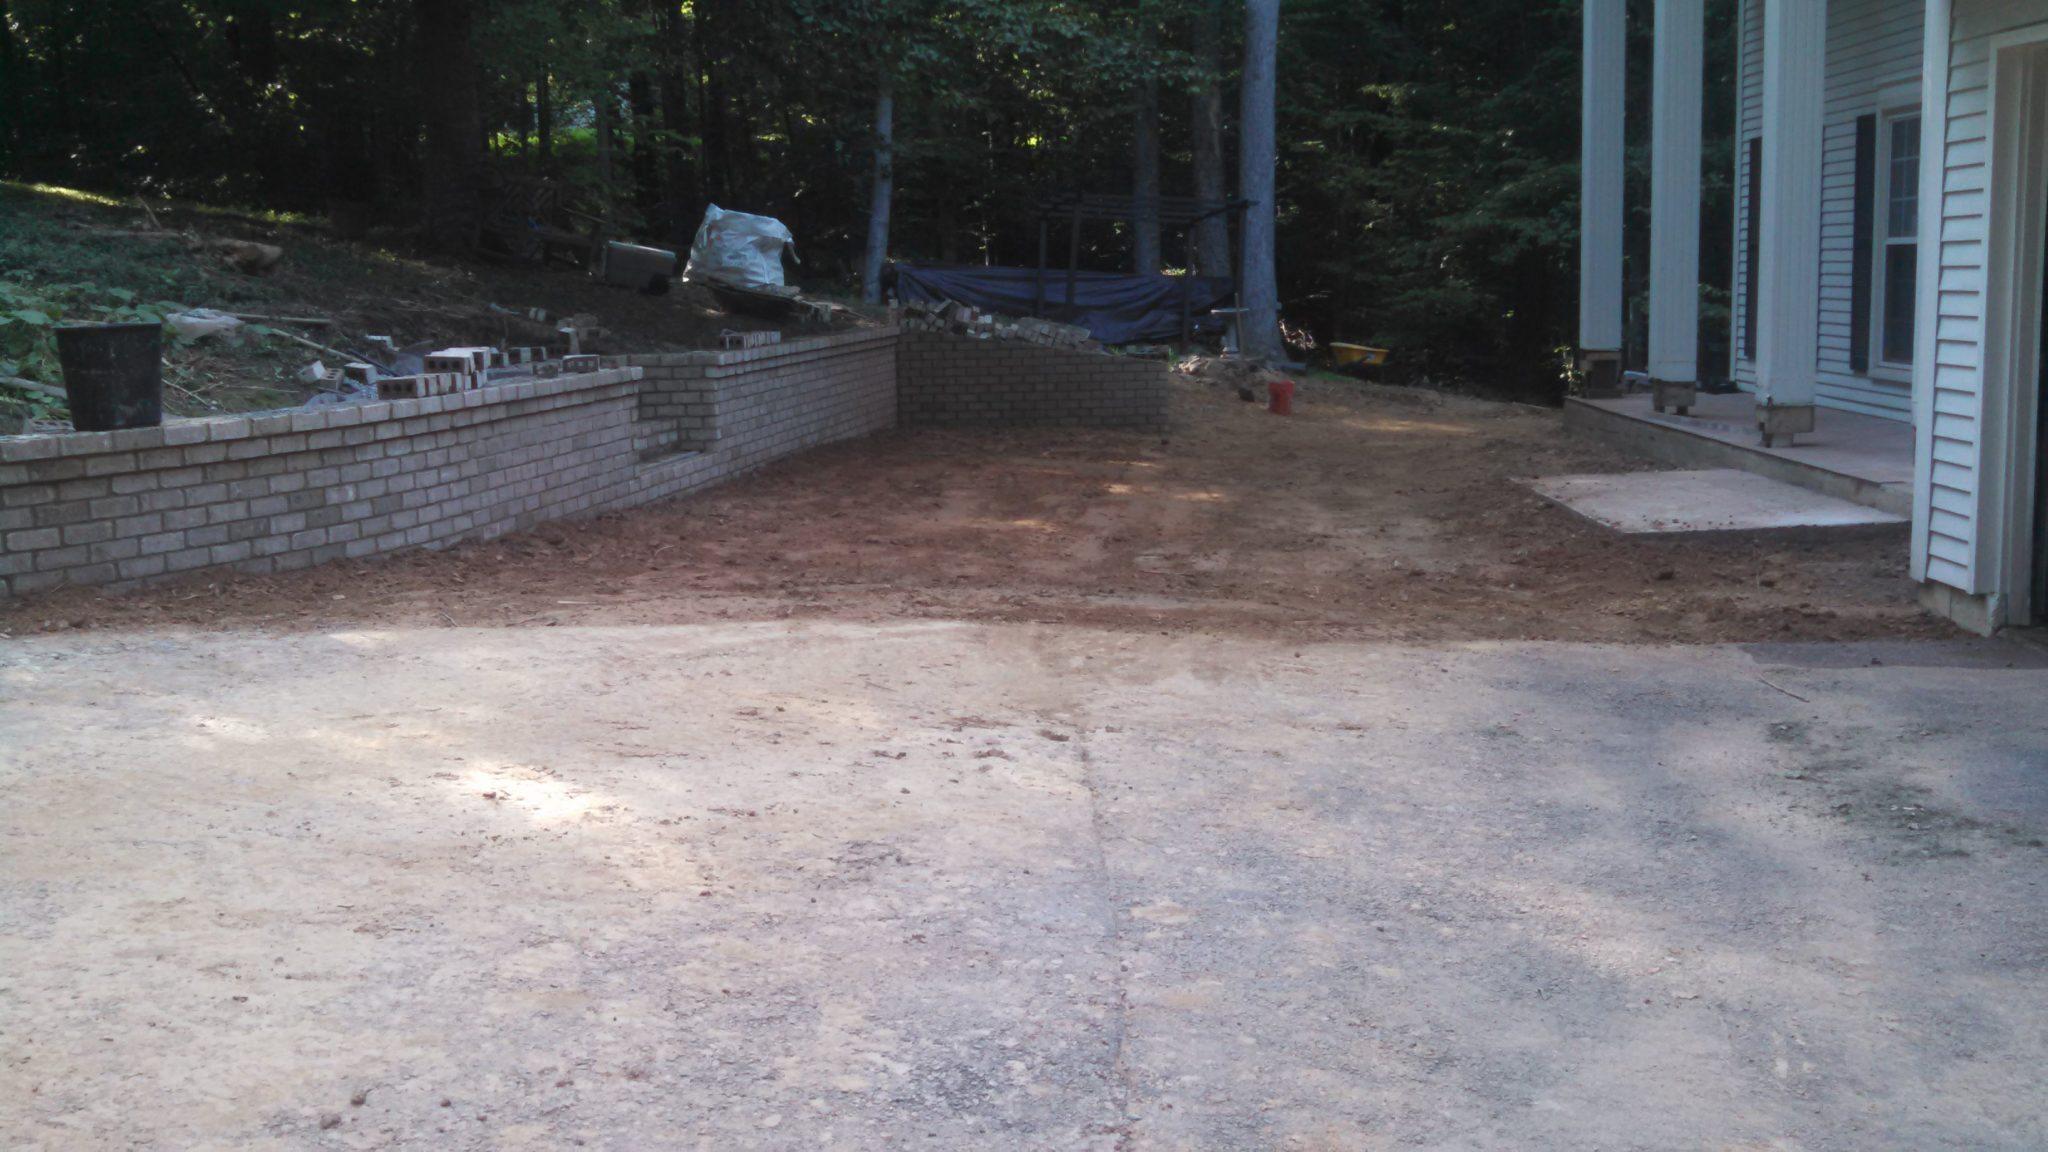 Diy man stuff building pillarscolumns patio retaining wall img20150816173252013 solutioingenieria Images